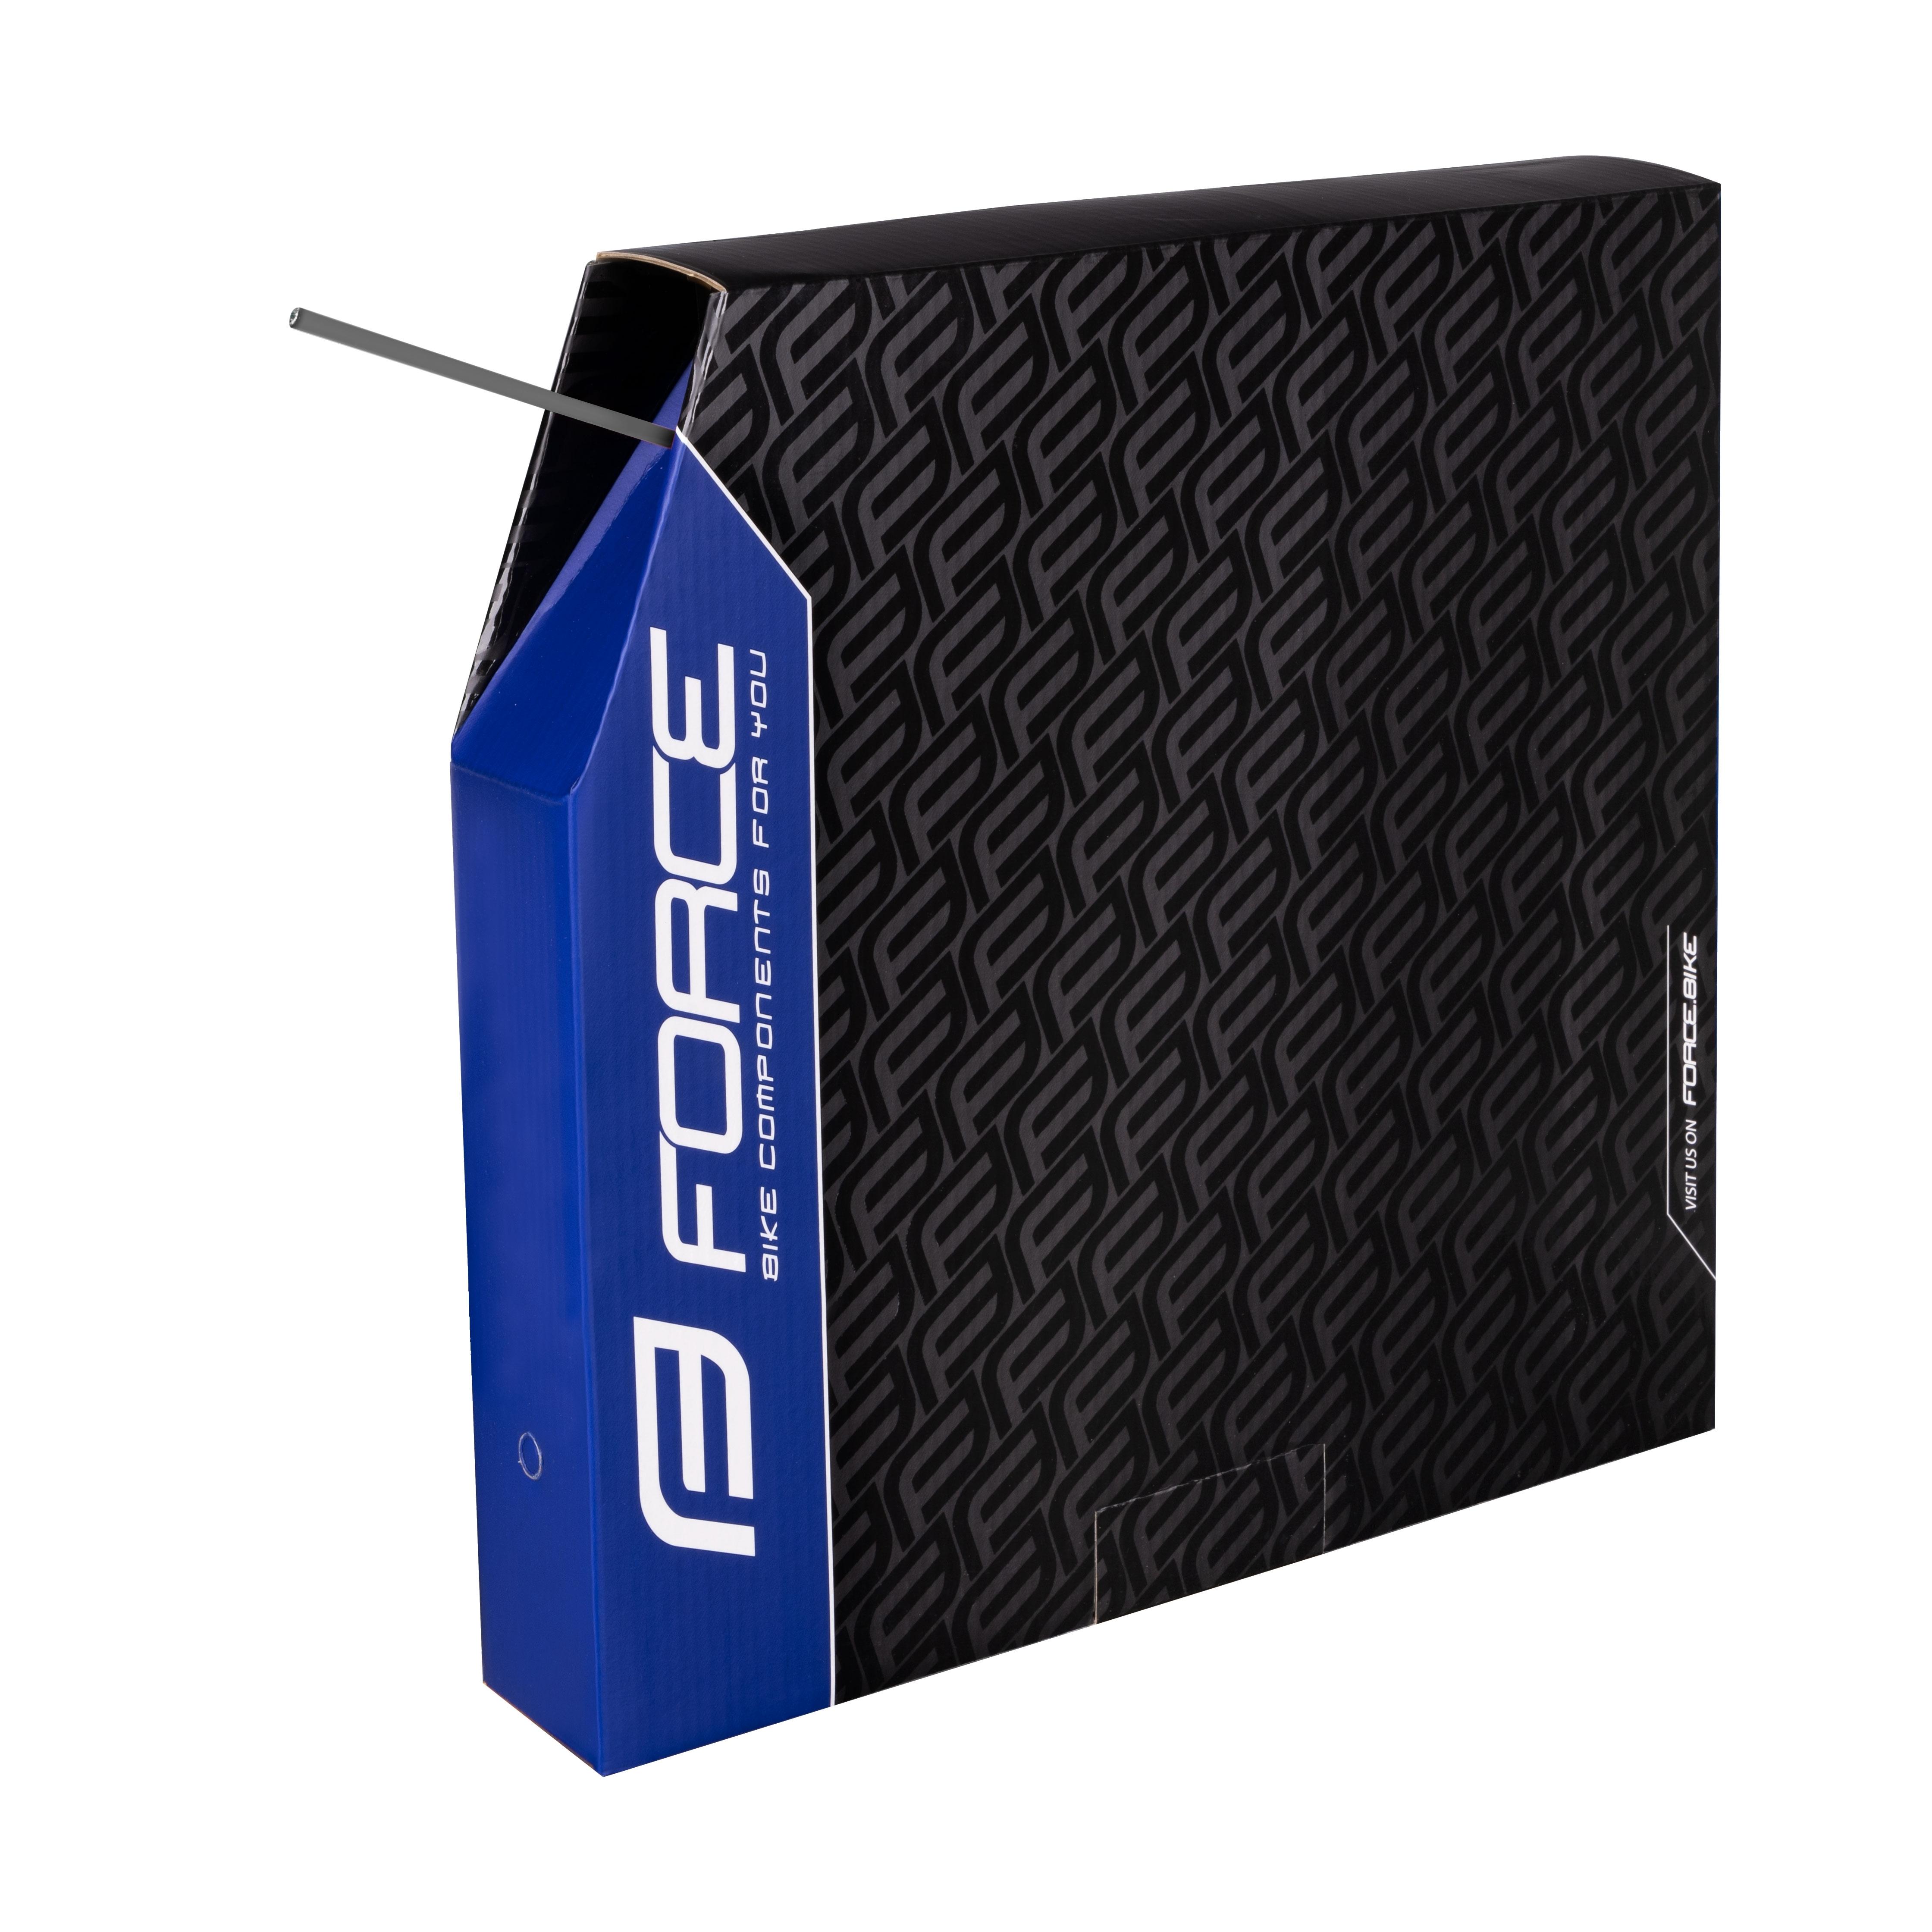 bowden brzdový FORCE 5mm,stříbrný 50m BOX